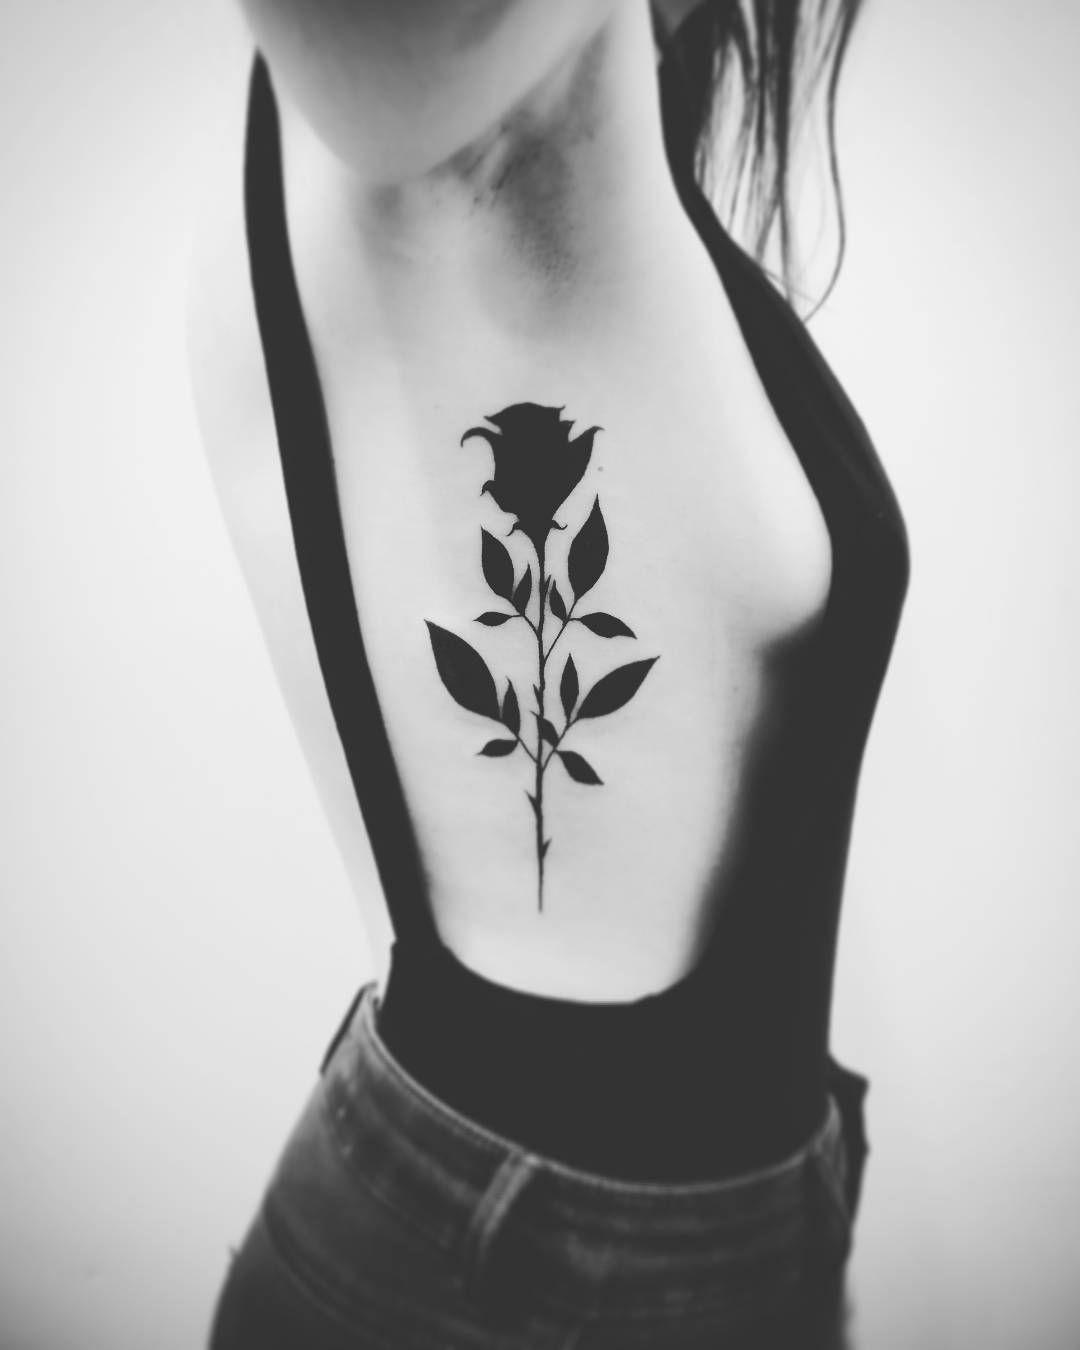 Épinglé sur Tattoo ideas